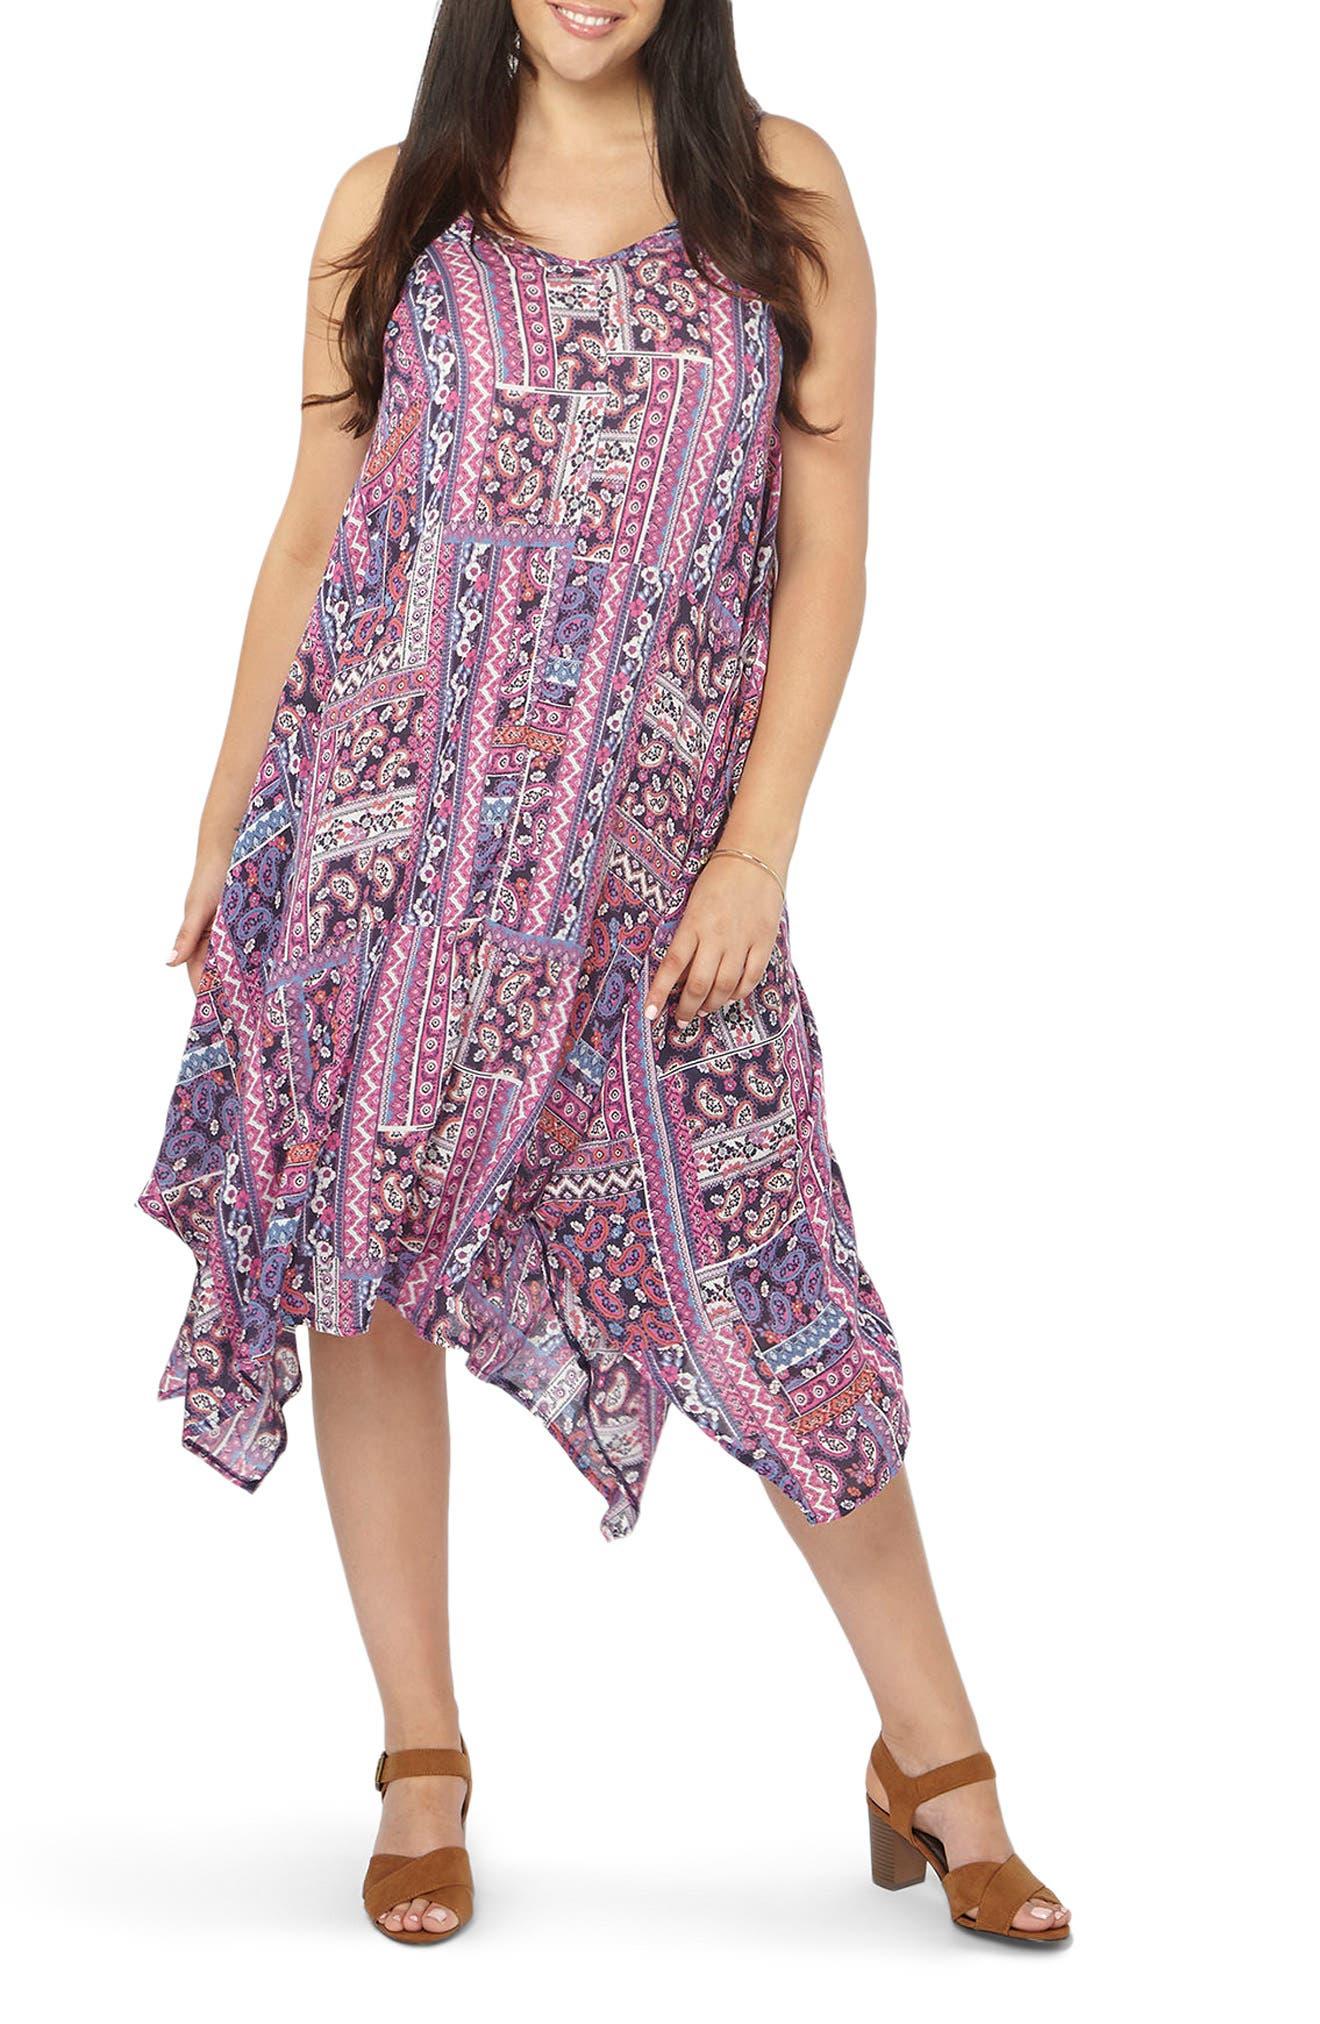 Alternate Image 1 Selected - Evans Handkerchief Hem Print A-Line Dress (Plus Size)